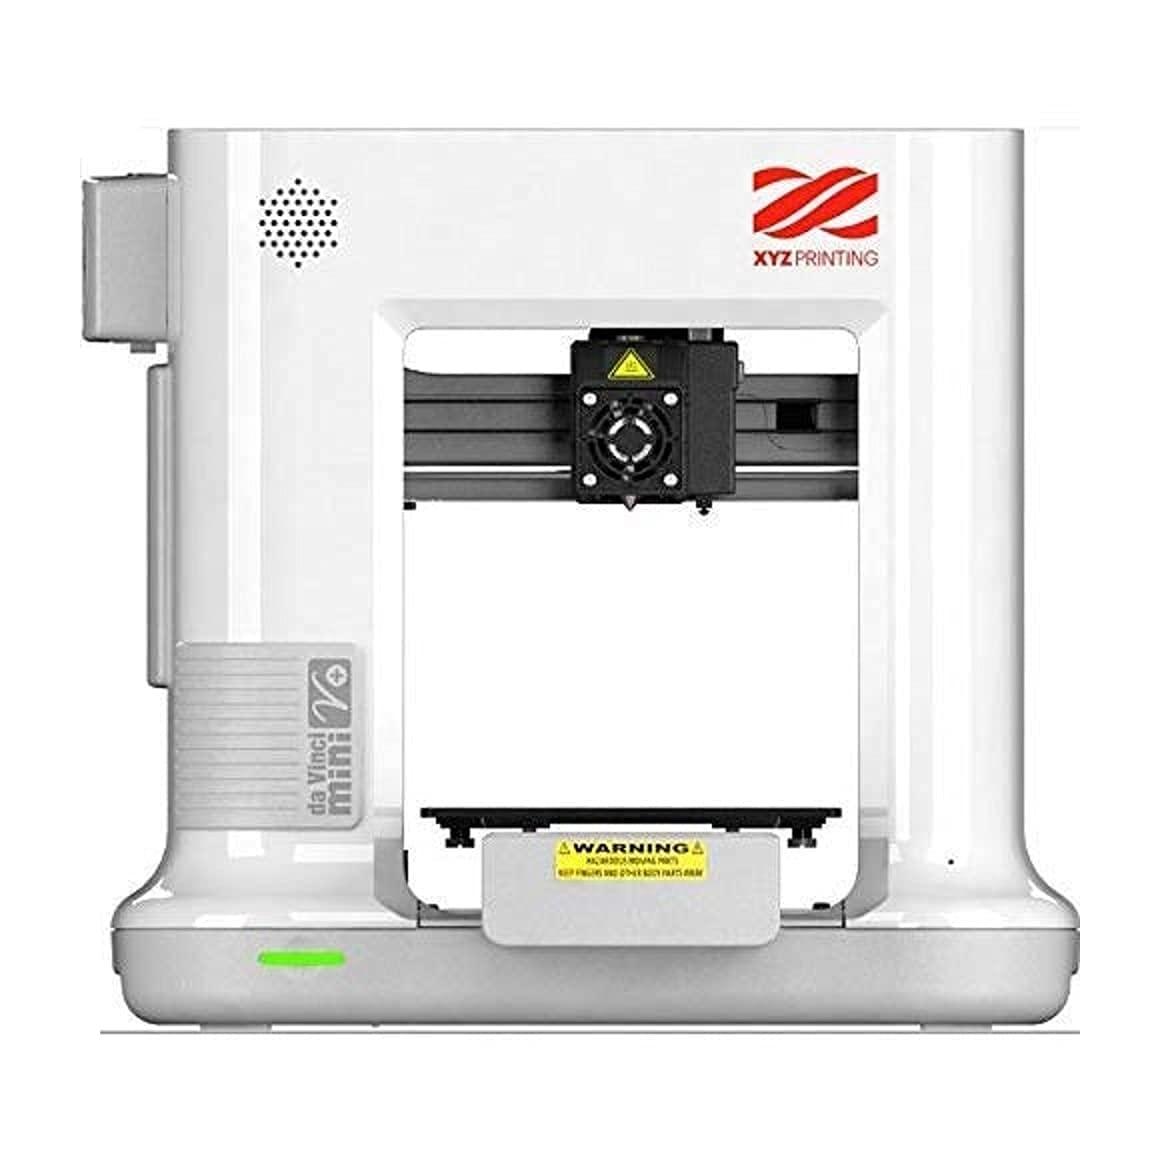 【3Dプリンタ】初心者が3Dプリンタを選んで買ってみた(3Dプリンタで遊ぼう日記1日目)